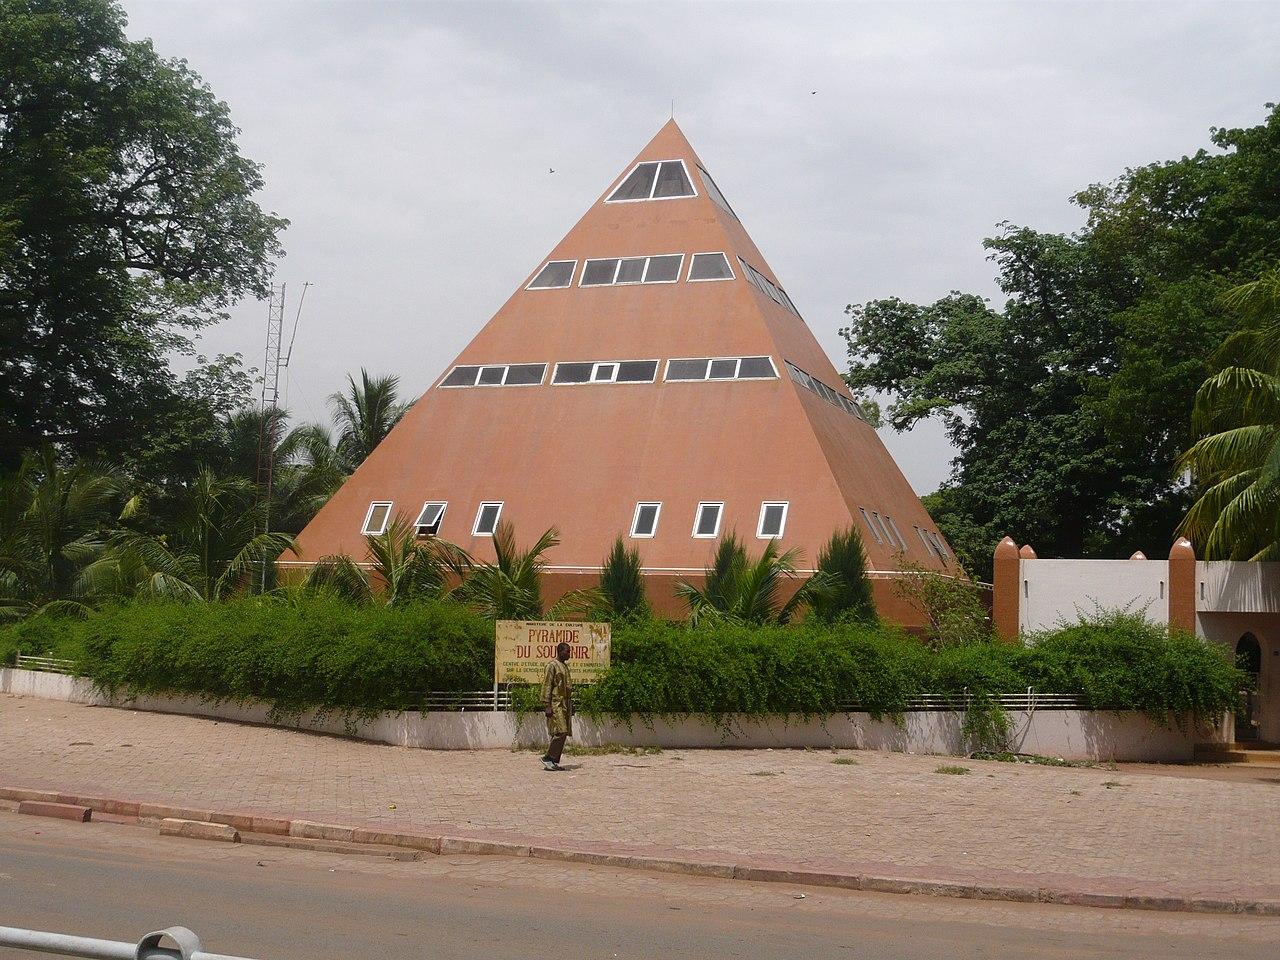 Anschlag auf das Radisson Blu Hotel in Bamako, Mali 1280px-Pyramide_du_souvenir_-_Bamako